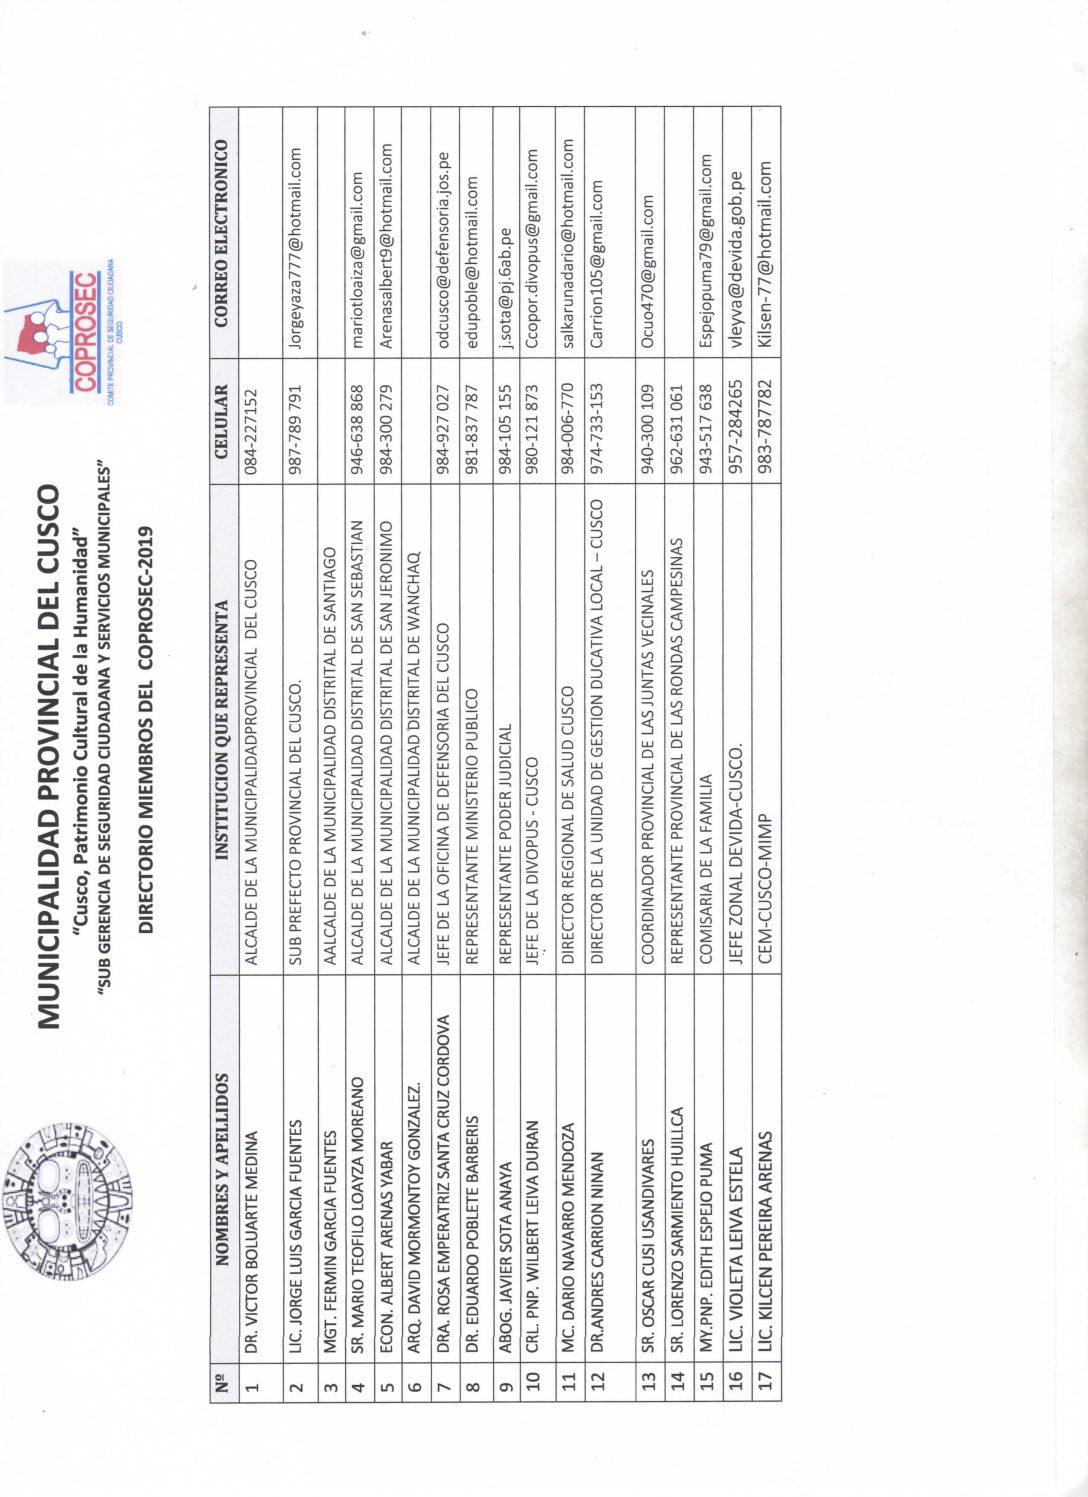 DIRECTORIO COPROSEC CUSCO PRIMER TRIMESTRE 2019